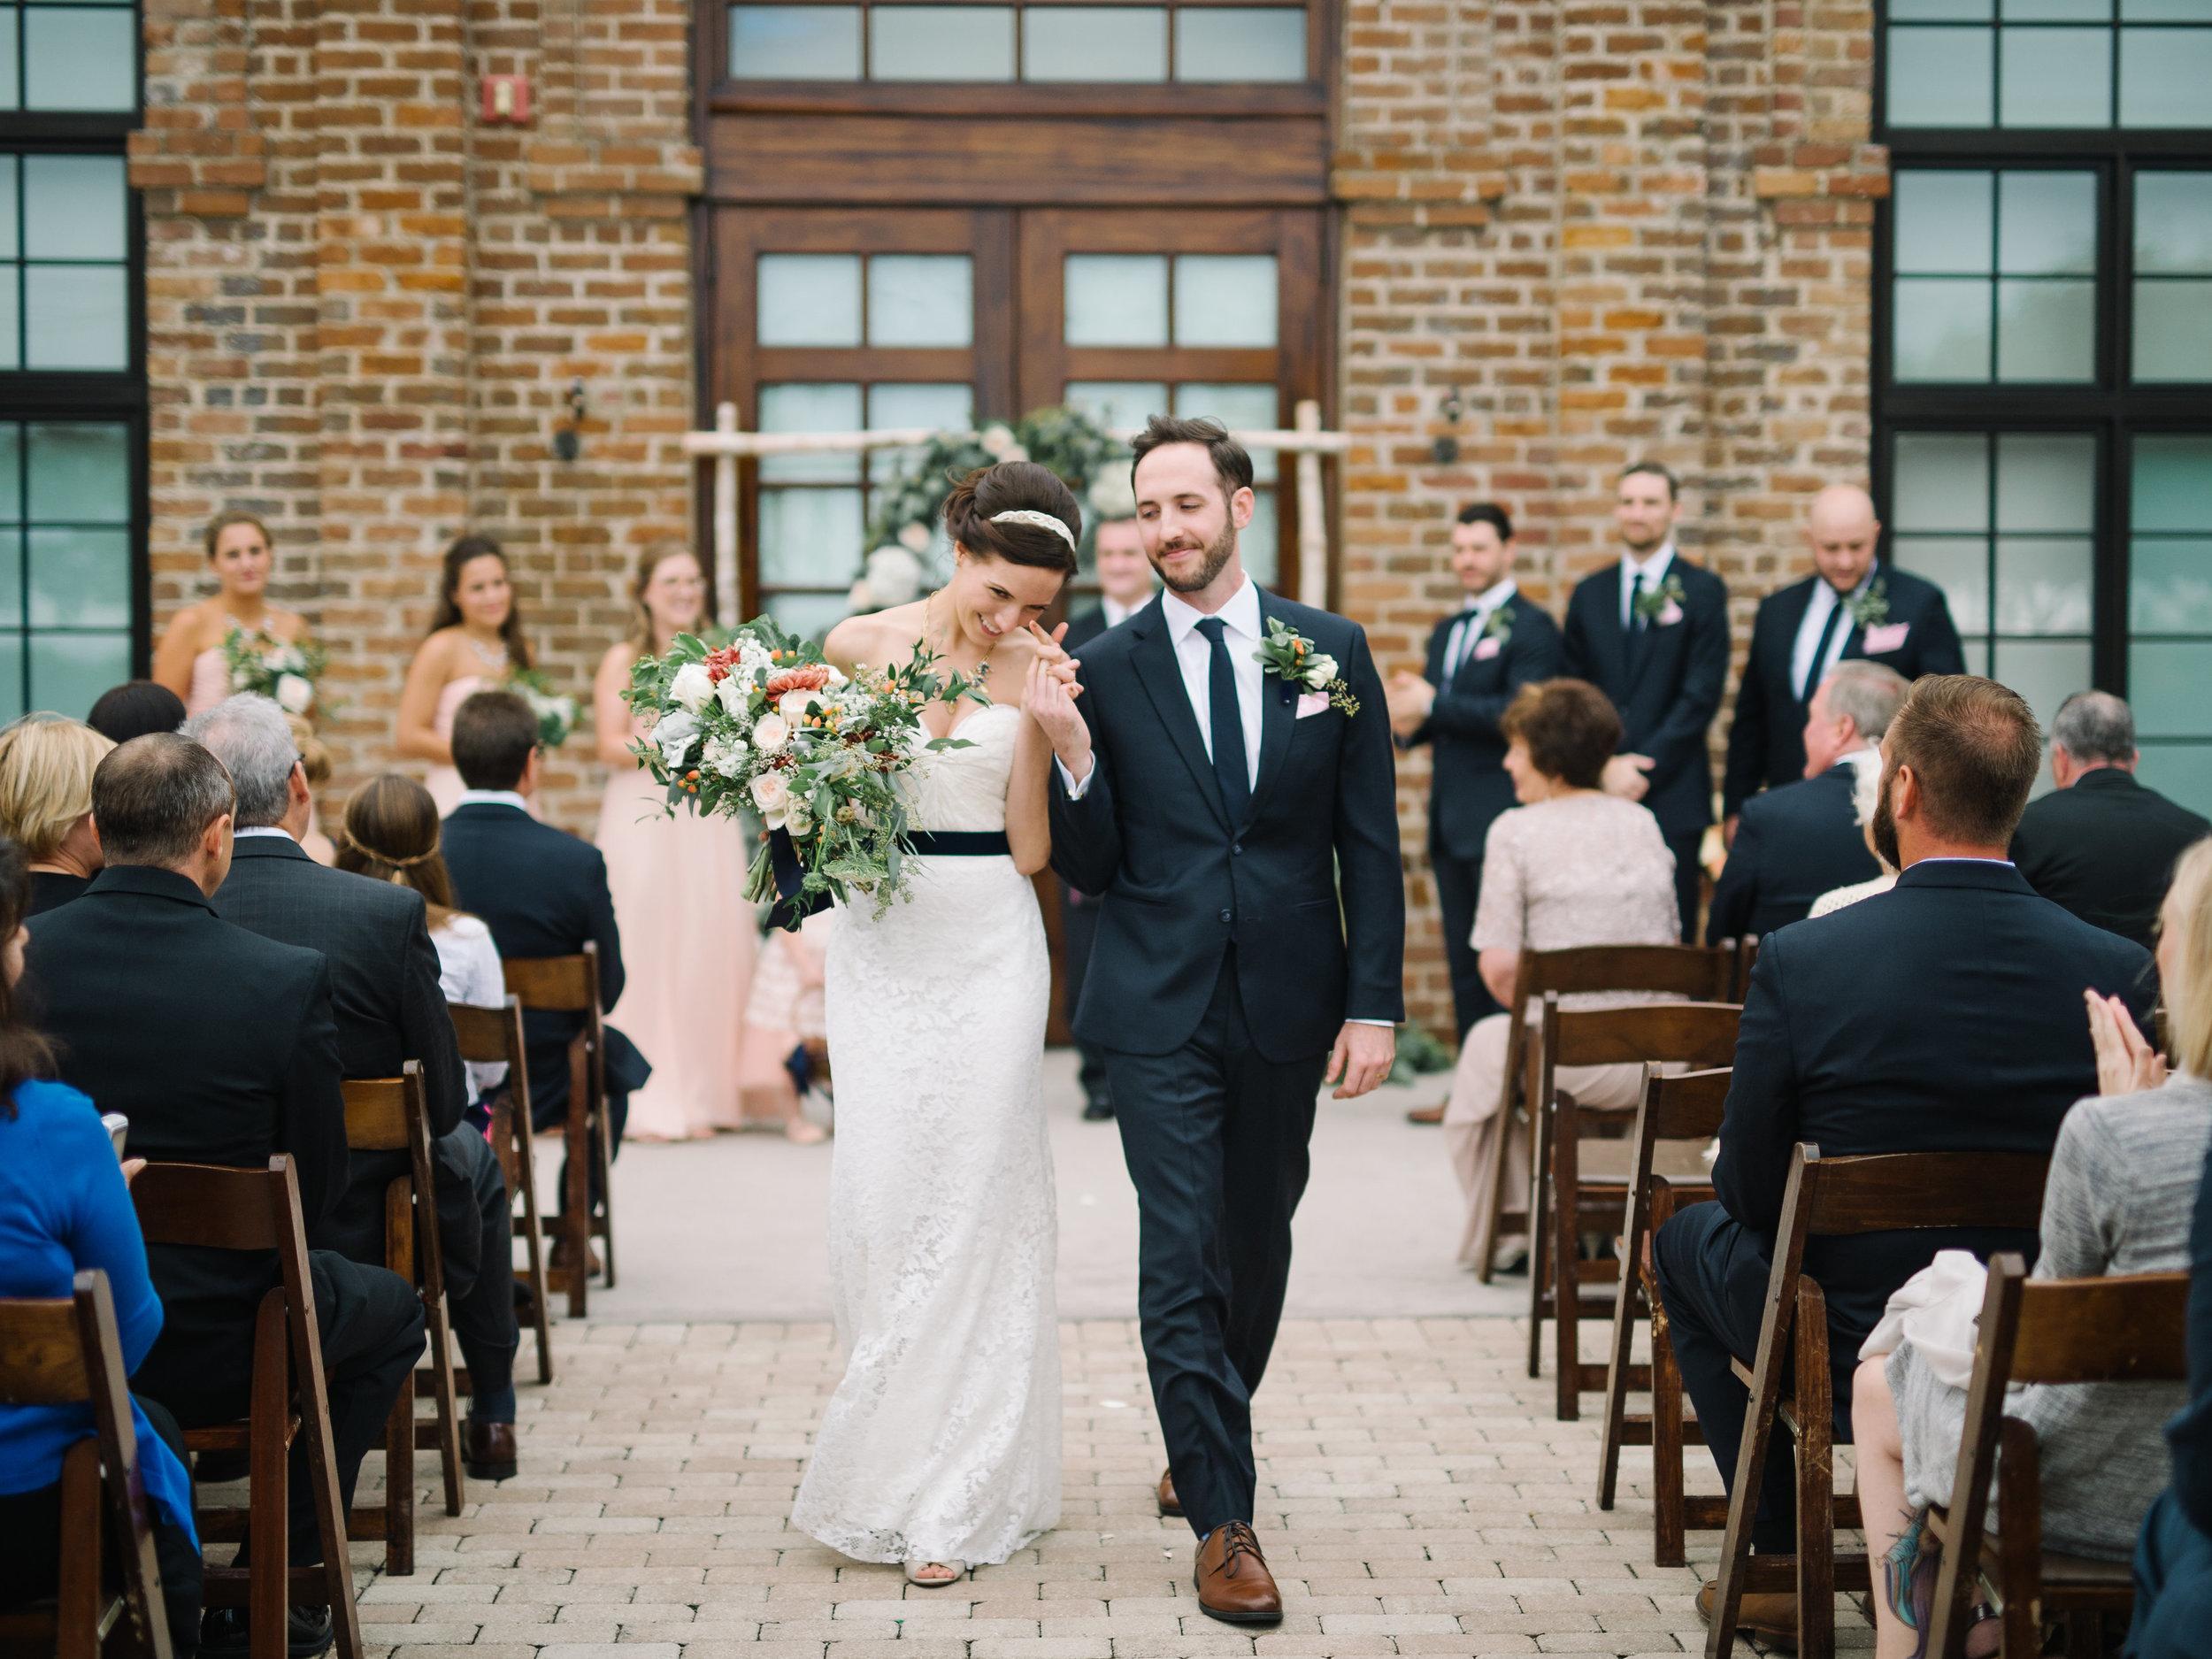 amber-and-paul-rach-loves-troy-charles-h-morris-center-wedding-sarah-seven-helene-lace-wedding-dress-ivory-and-beau-bridal-boutique-savannah-wedding-planner-savannah-event-designer-savannah-florist-savannah-weddings-savannah-bridal-boutique-29.jpg